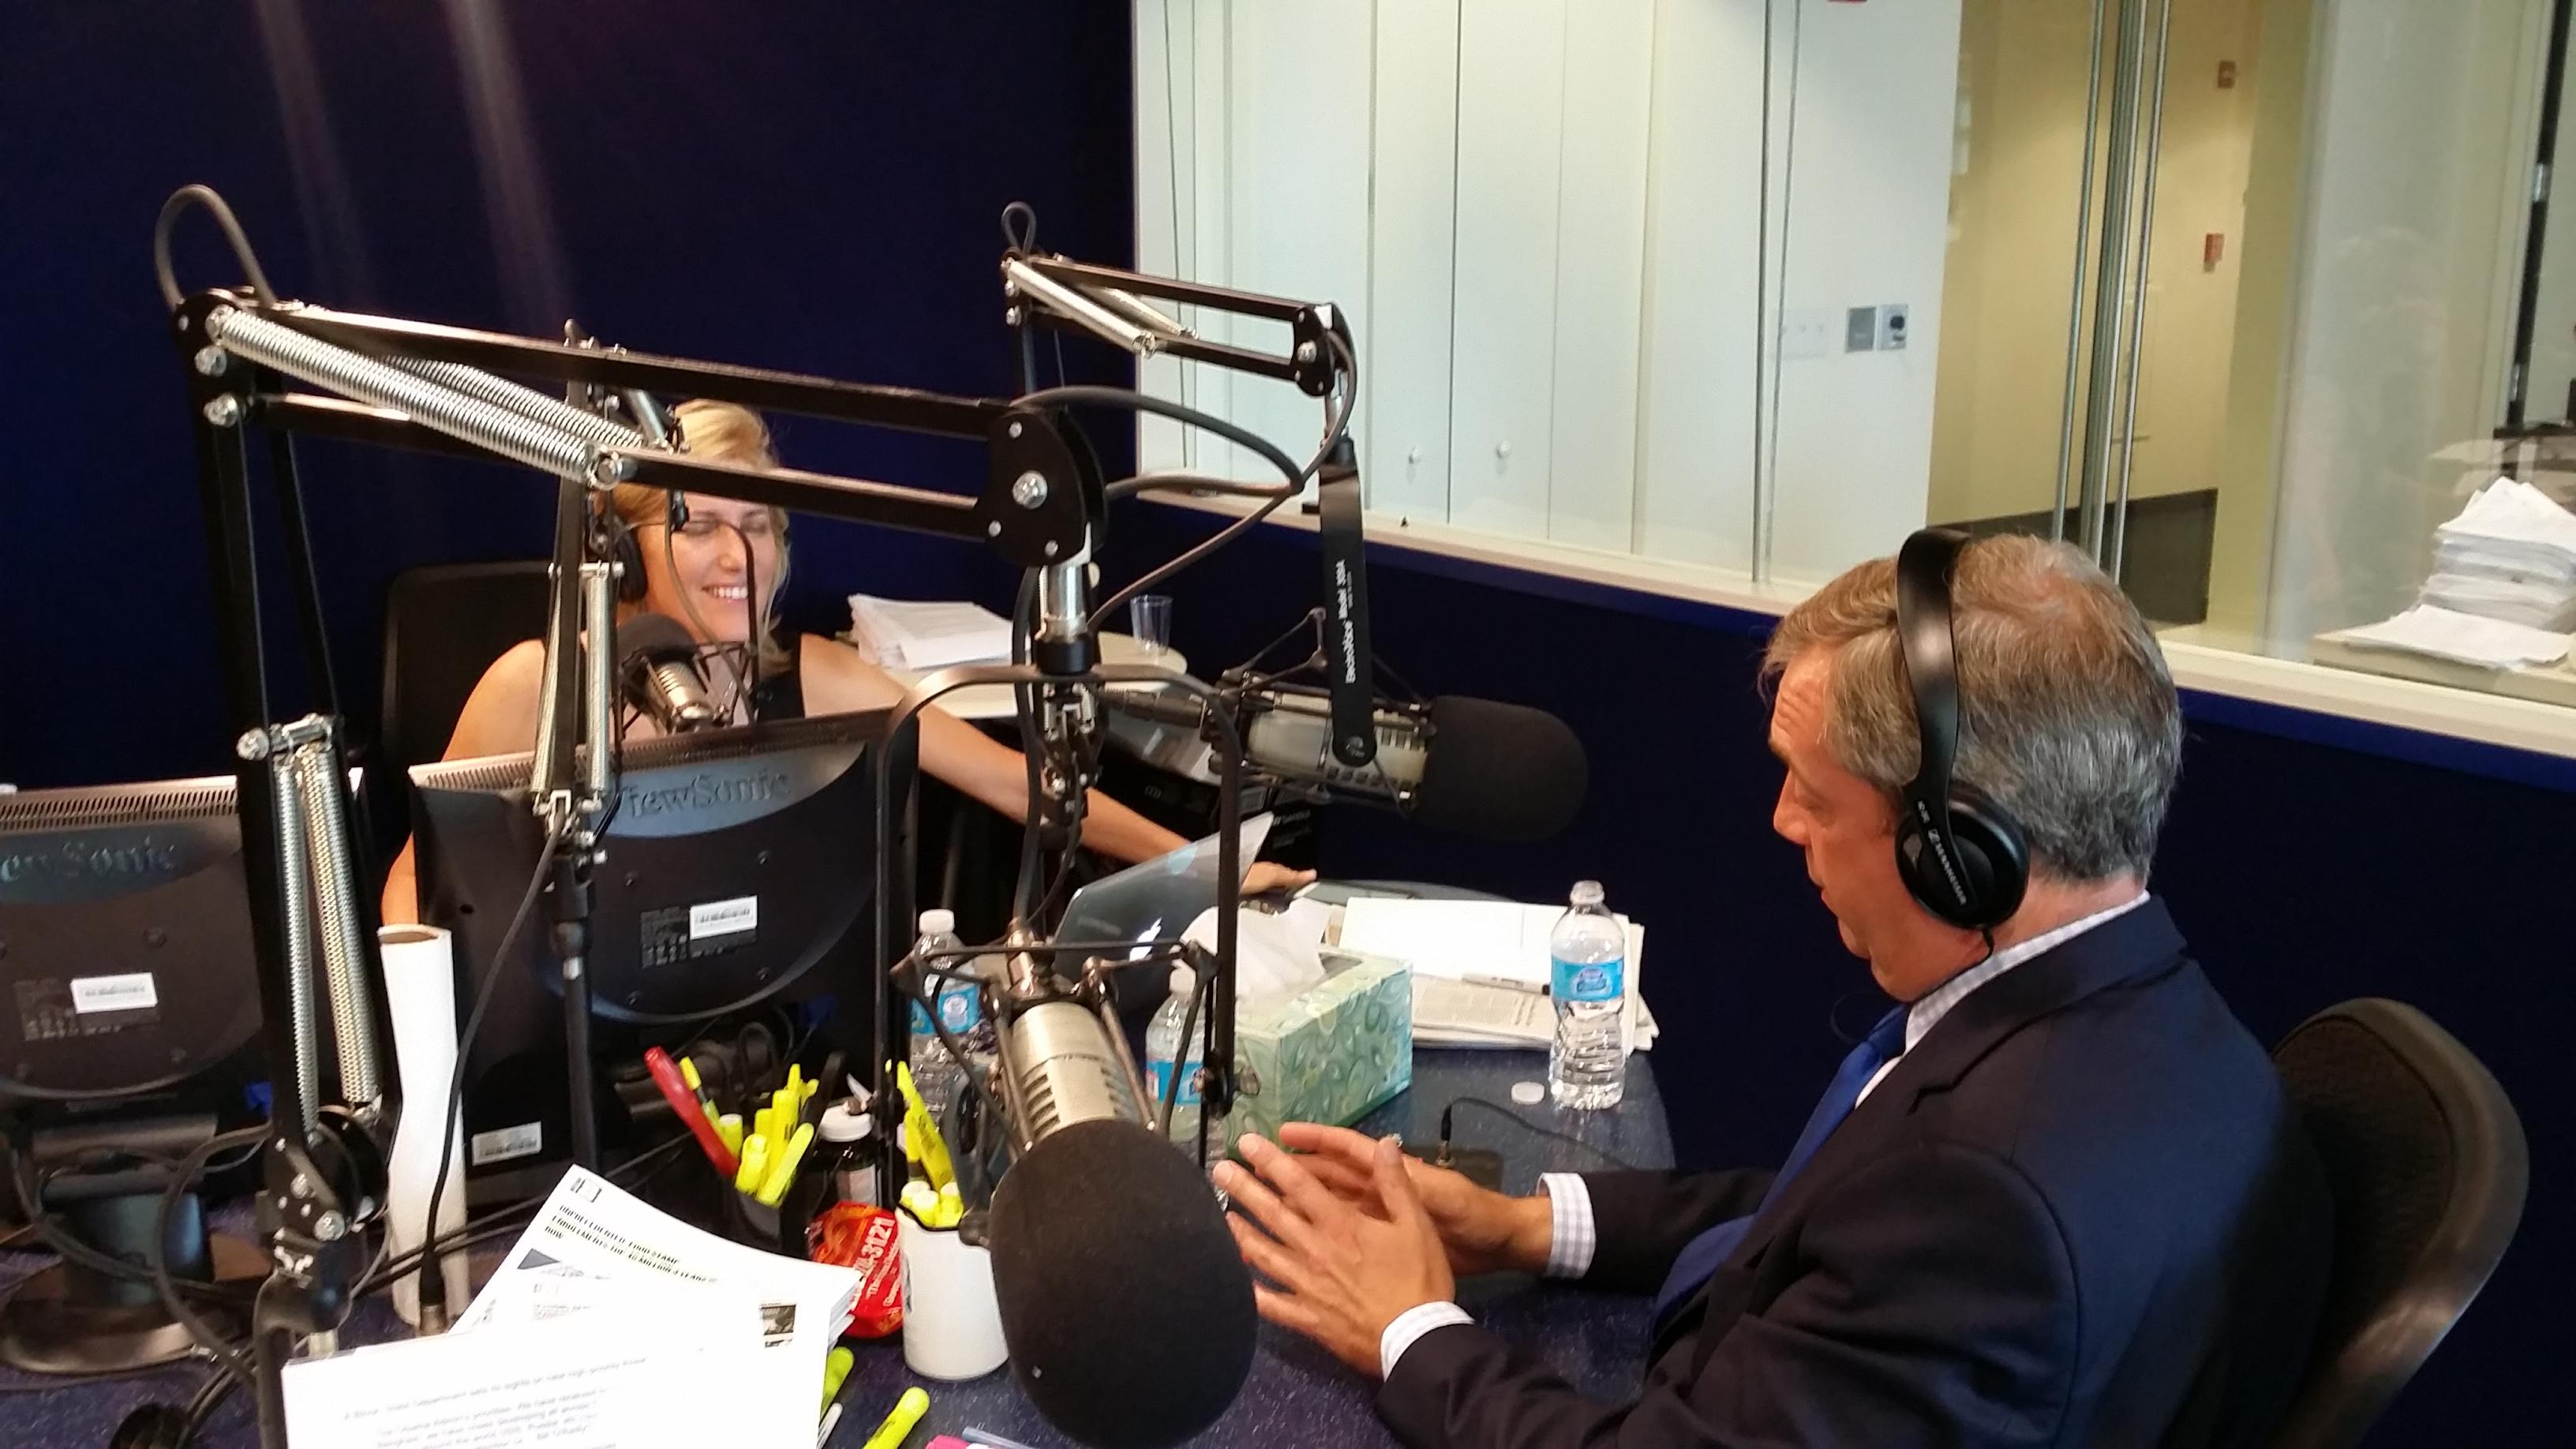 LISTEN: UKIP Leader Nigel Farage Slams EU, Piers Morgan, and Admits 'I'm Flawed' on Laura Ingraham Radio Show